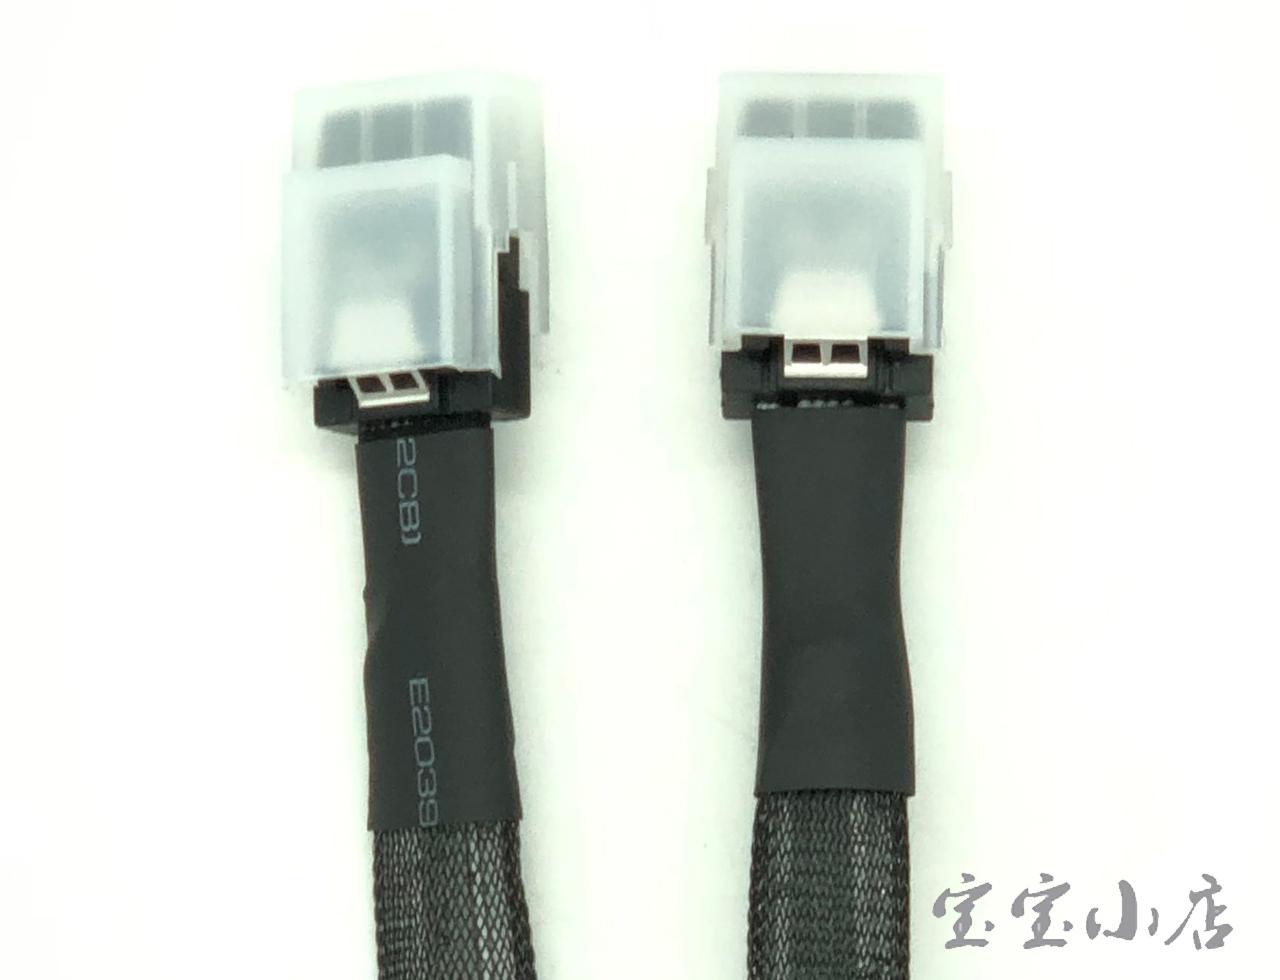 新到货76pcs 惠普HP Mini SAS SFF-8087 to Mini SAS SFF-8087 89cm Cable 663139-001 667277-001 连接线